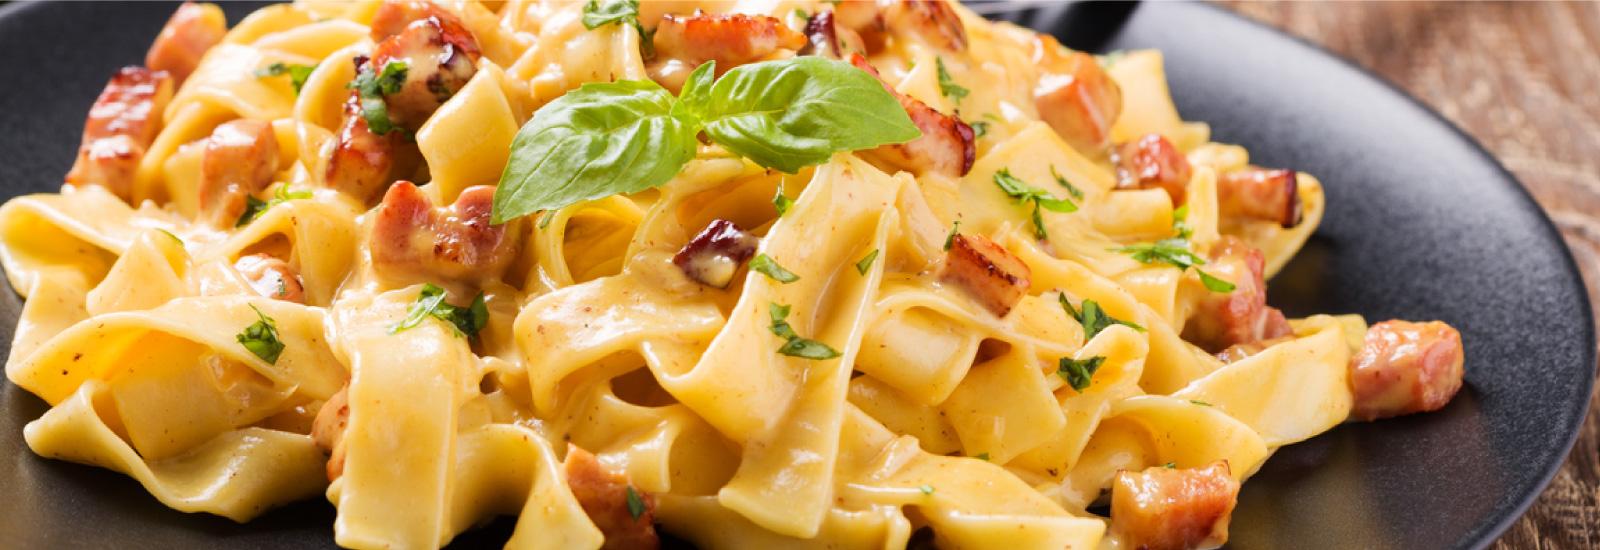 Italian Restaurants in Yuba City